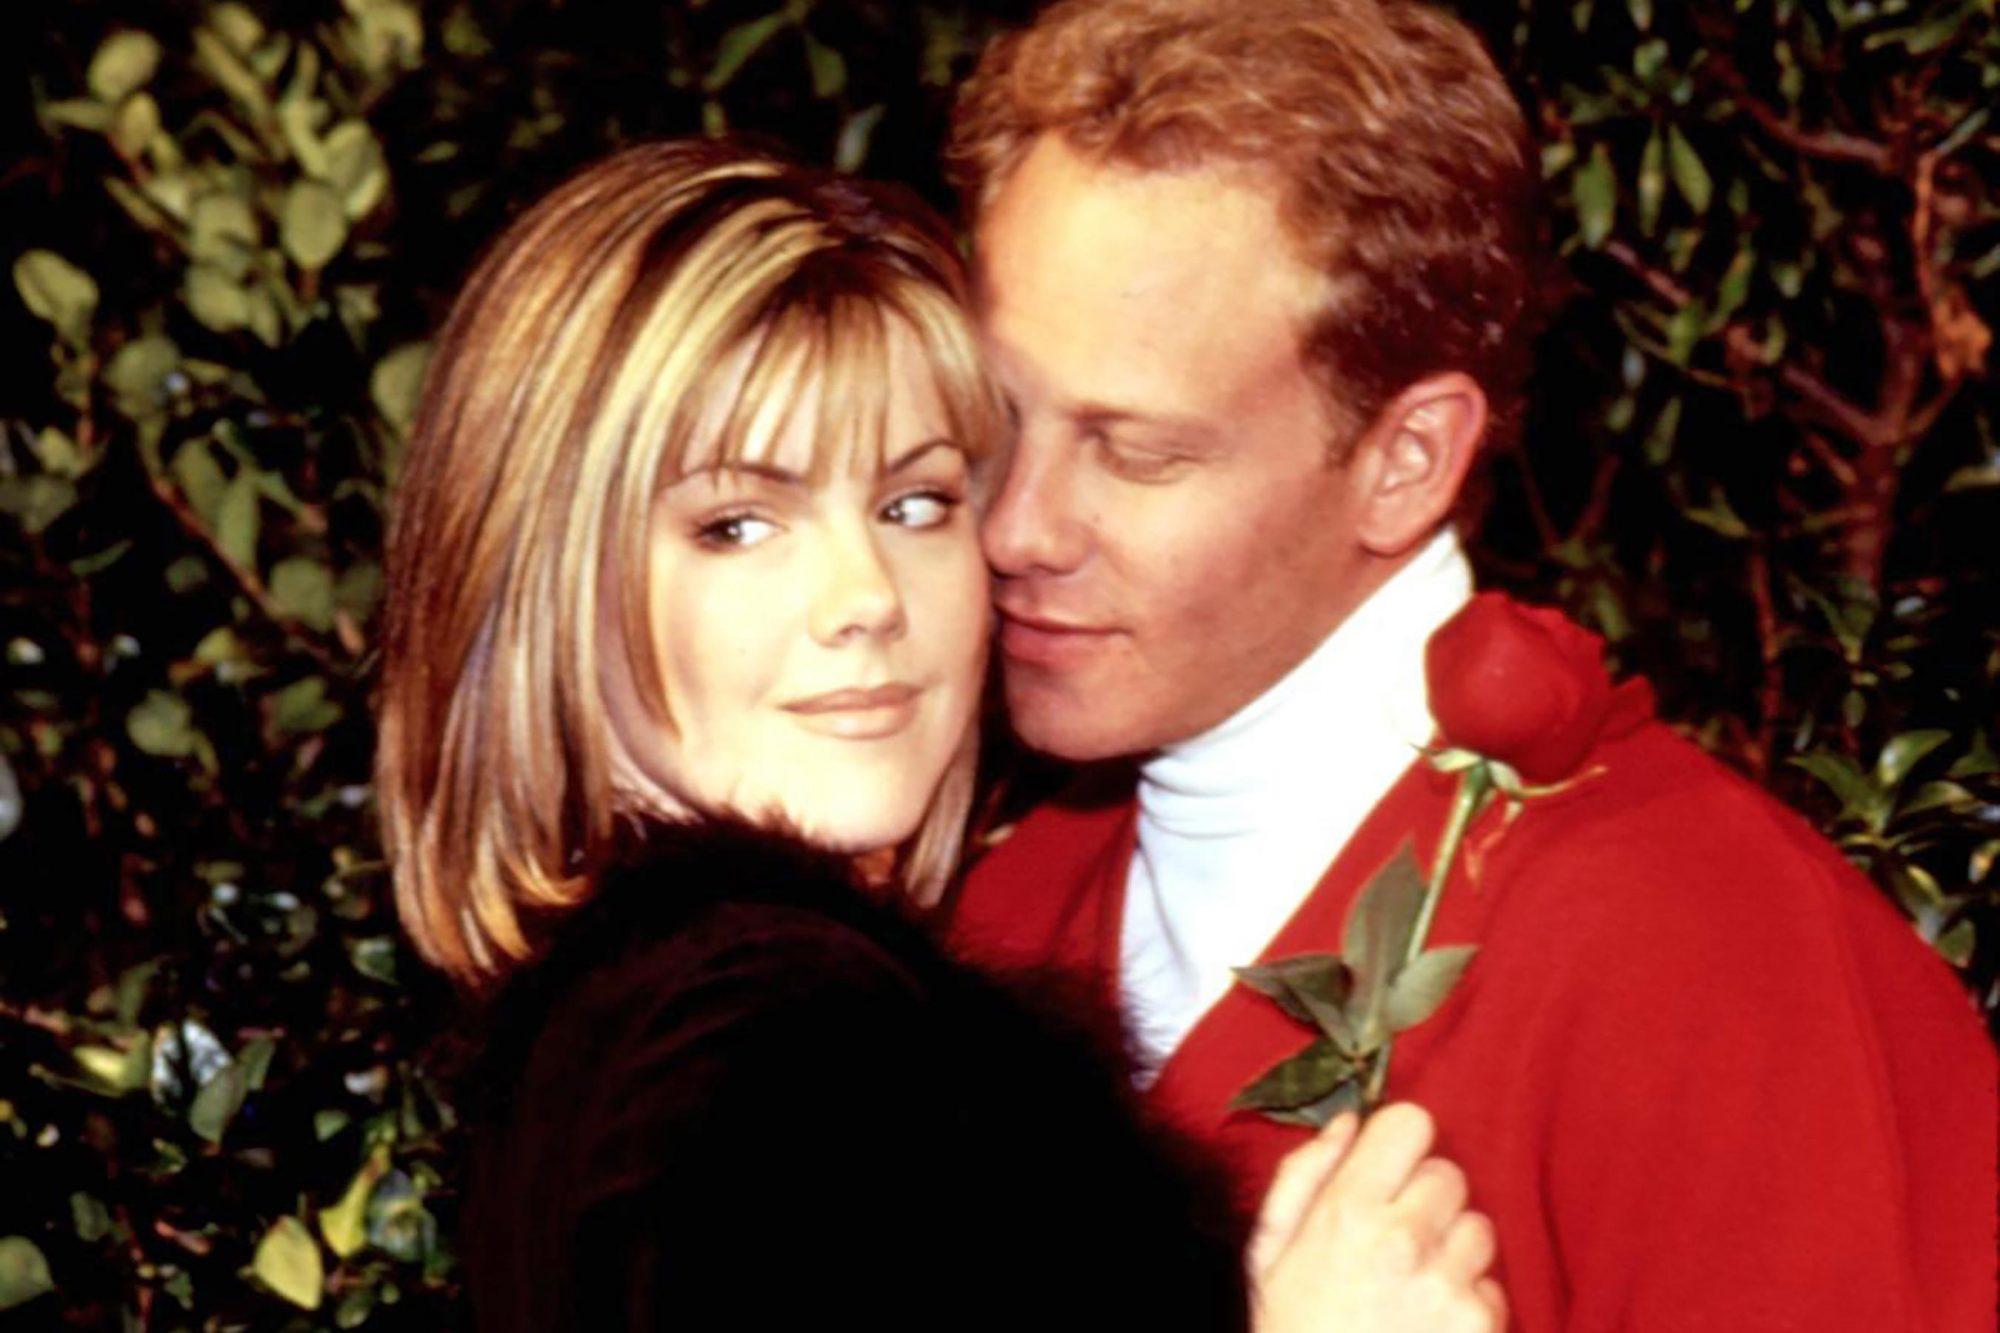 BEVERLY HILLS, 90210, 1990-2000, Kathleen Robertson, Ian Ziering, 1993-97